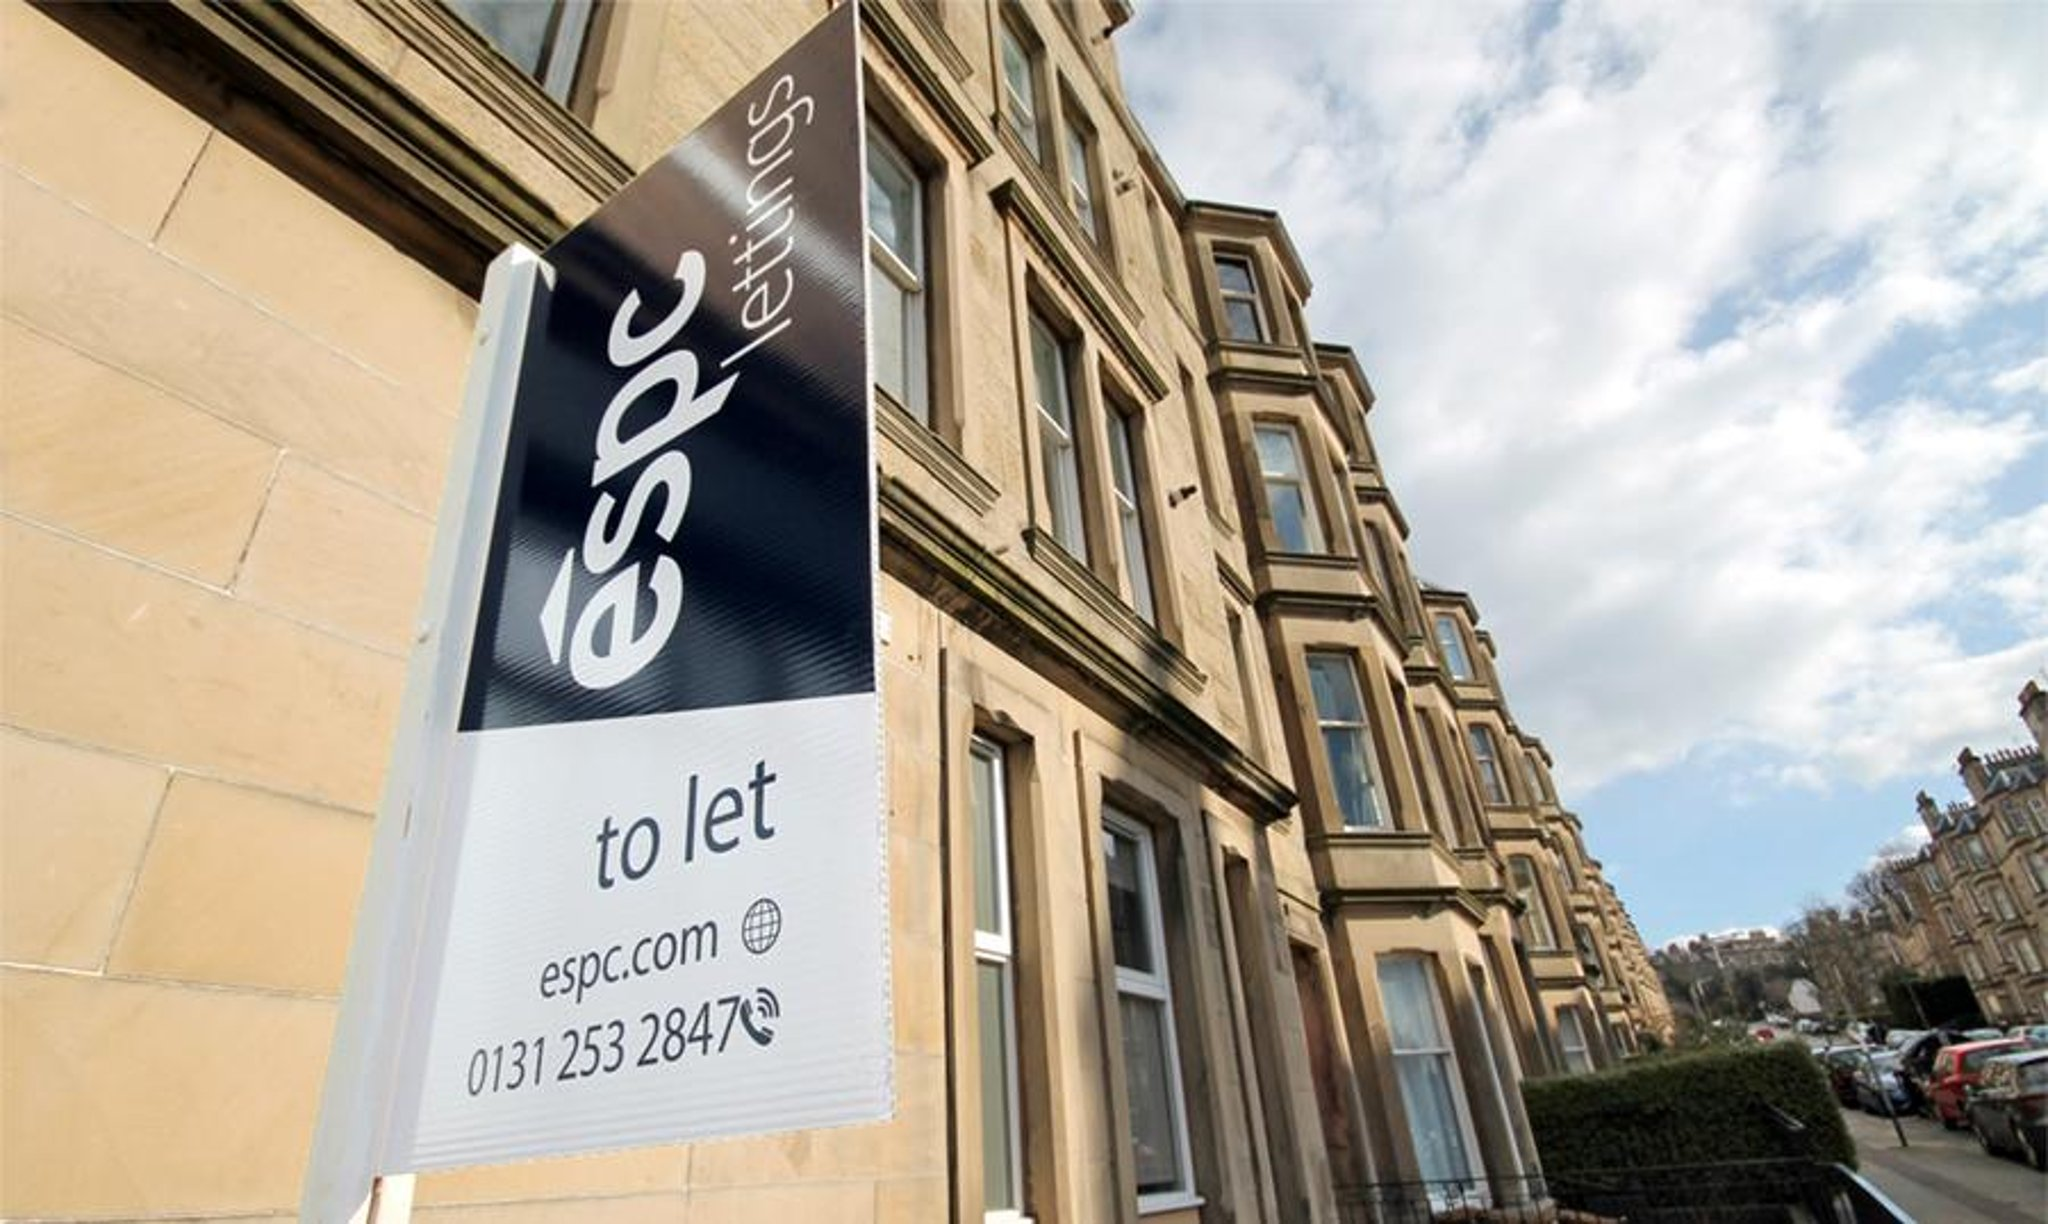 Lonjakan jumlah properti Edinburgh yang disewa pada hari yang sama saat mereka terdaftar